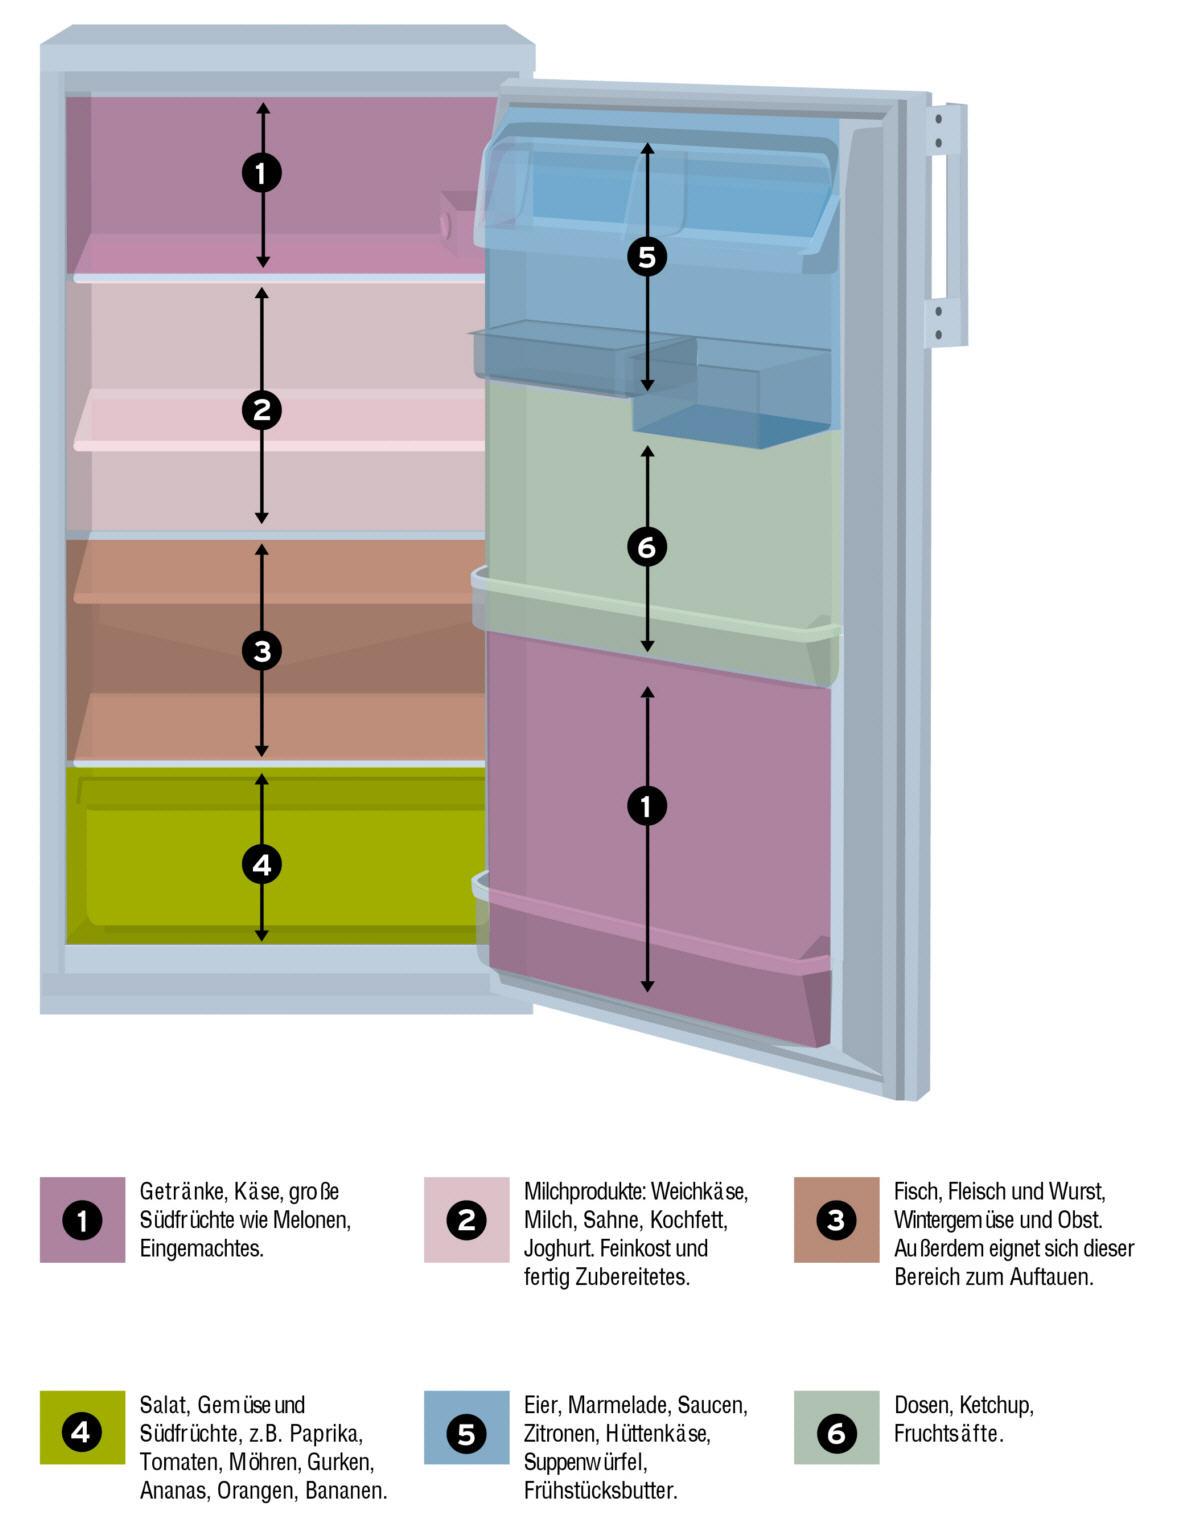 ersatzteile waschmaschinen geschirrsp ler eherd k hlger te tiefk hlger te. Black Bedroom Furniture Sets. Home Design Ideas